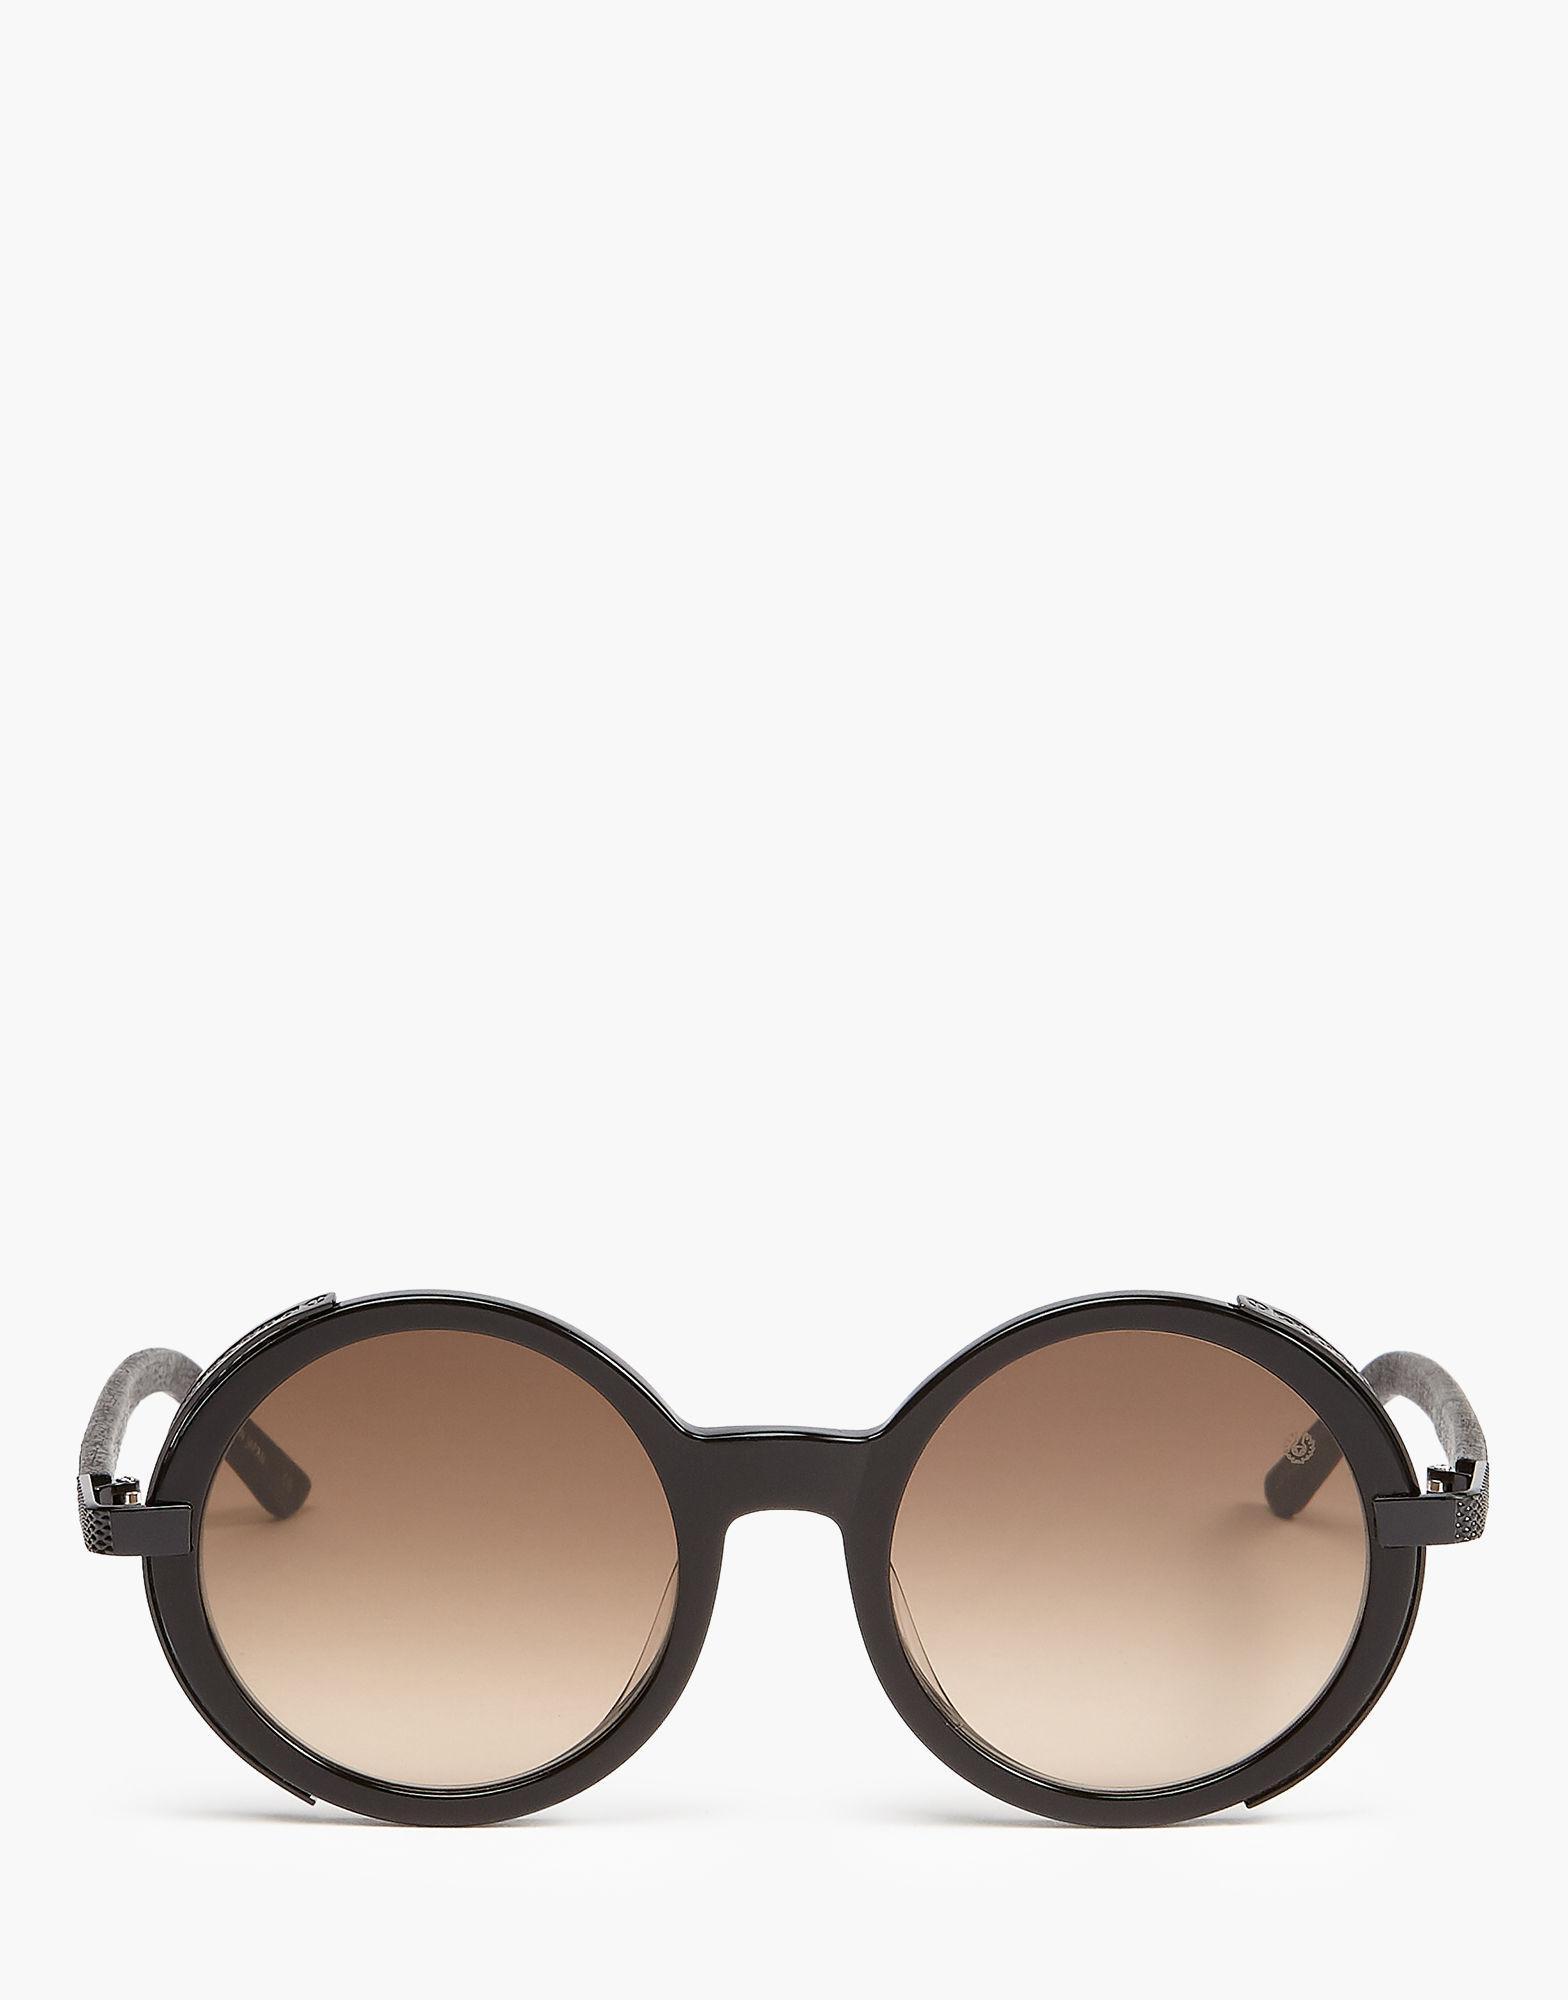 8f5302fc6a Belstaff Monaco Round Sunglasses in Black - Lyst